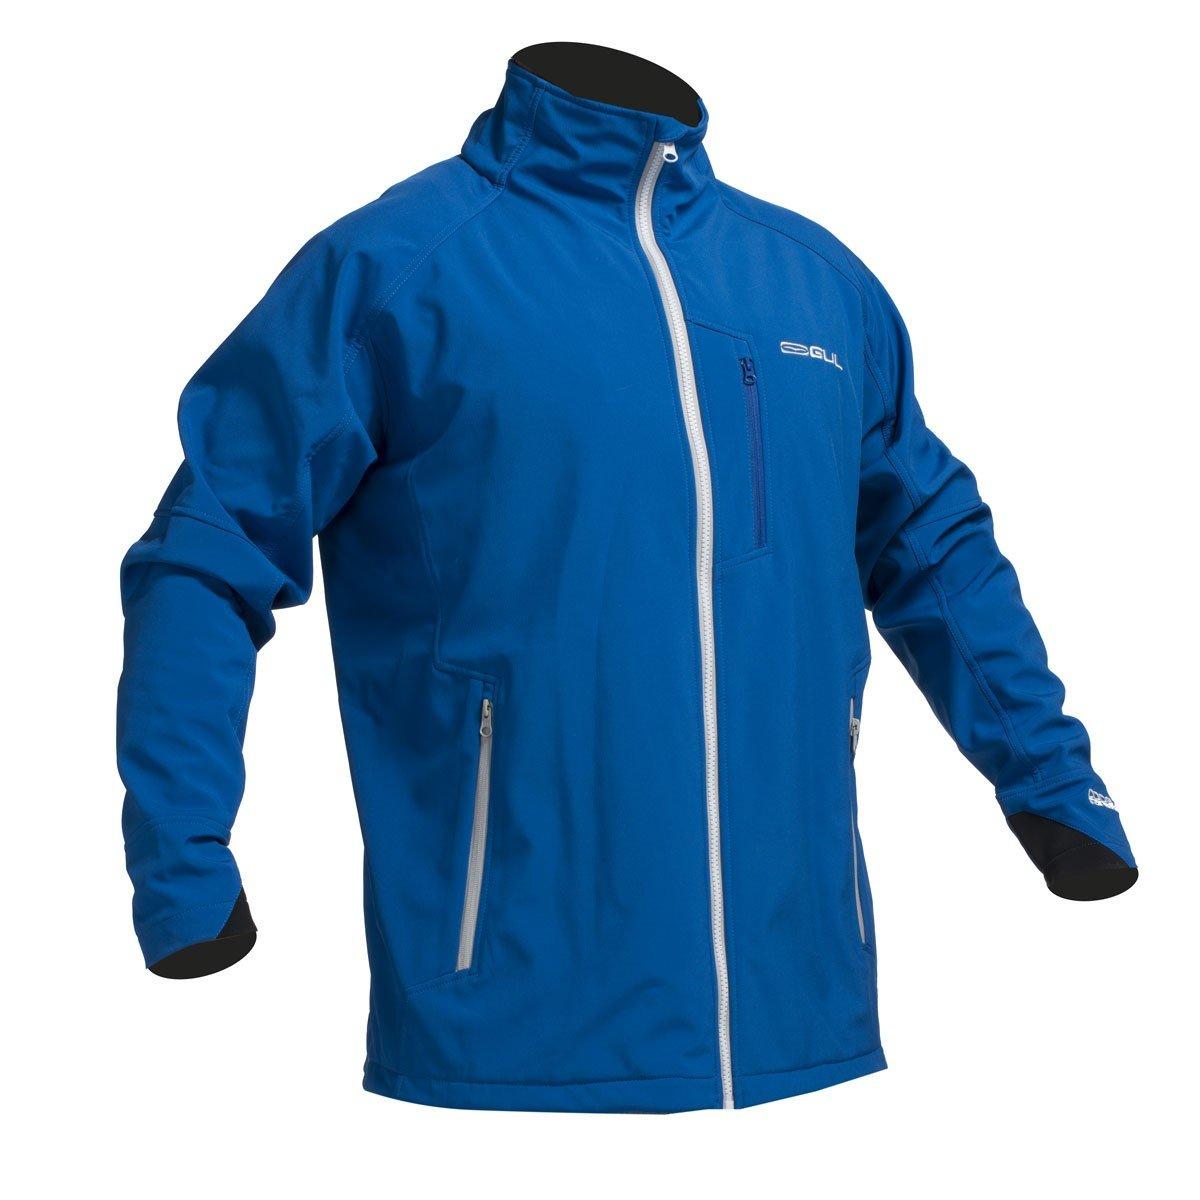 Gul Code Zero Softshell Jacket   K3mj32-A9